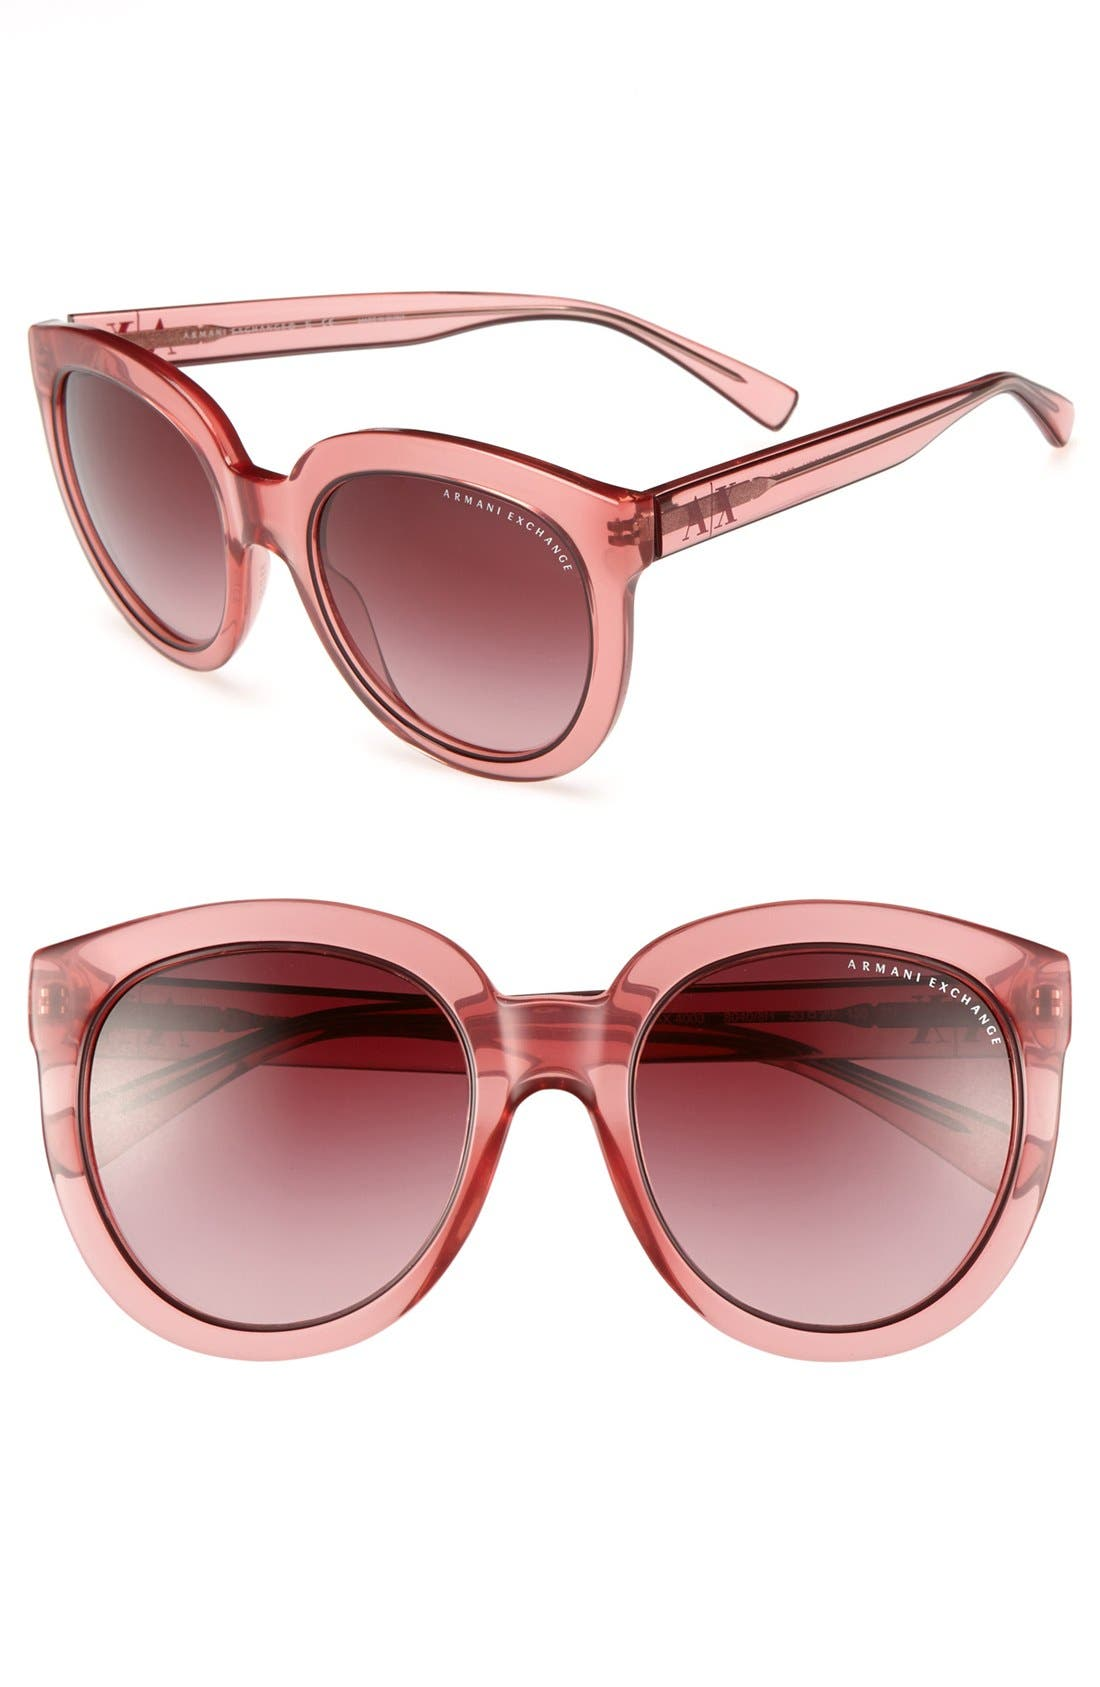 Alternate Image 1 Selected - AX Armani Exchange 'Transparent Glam' 53mm Sunglasses